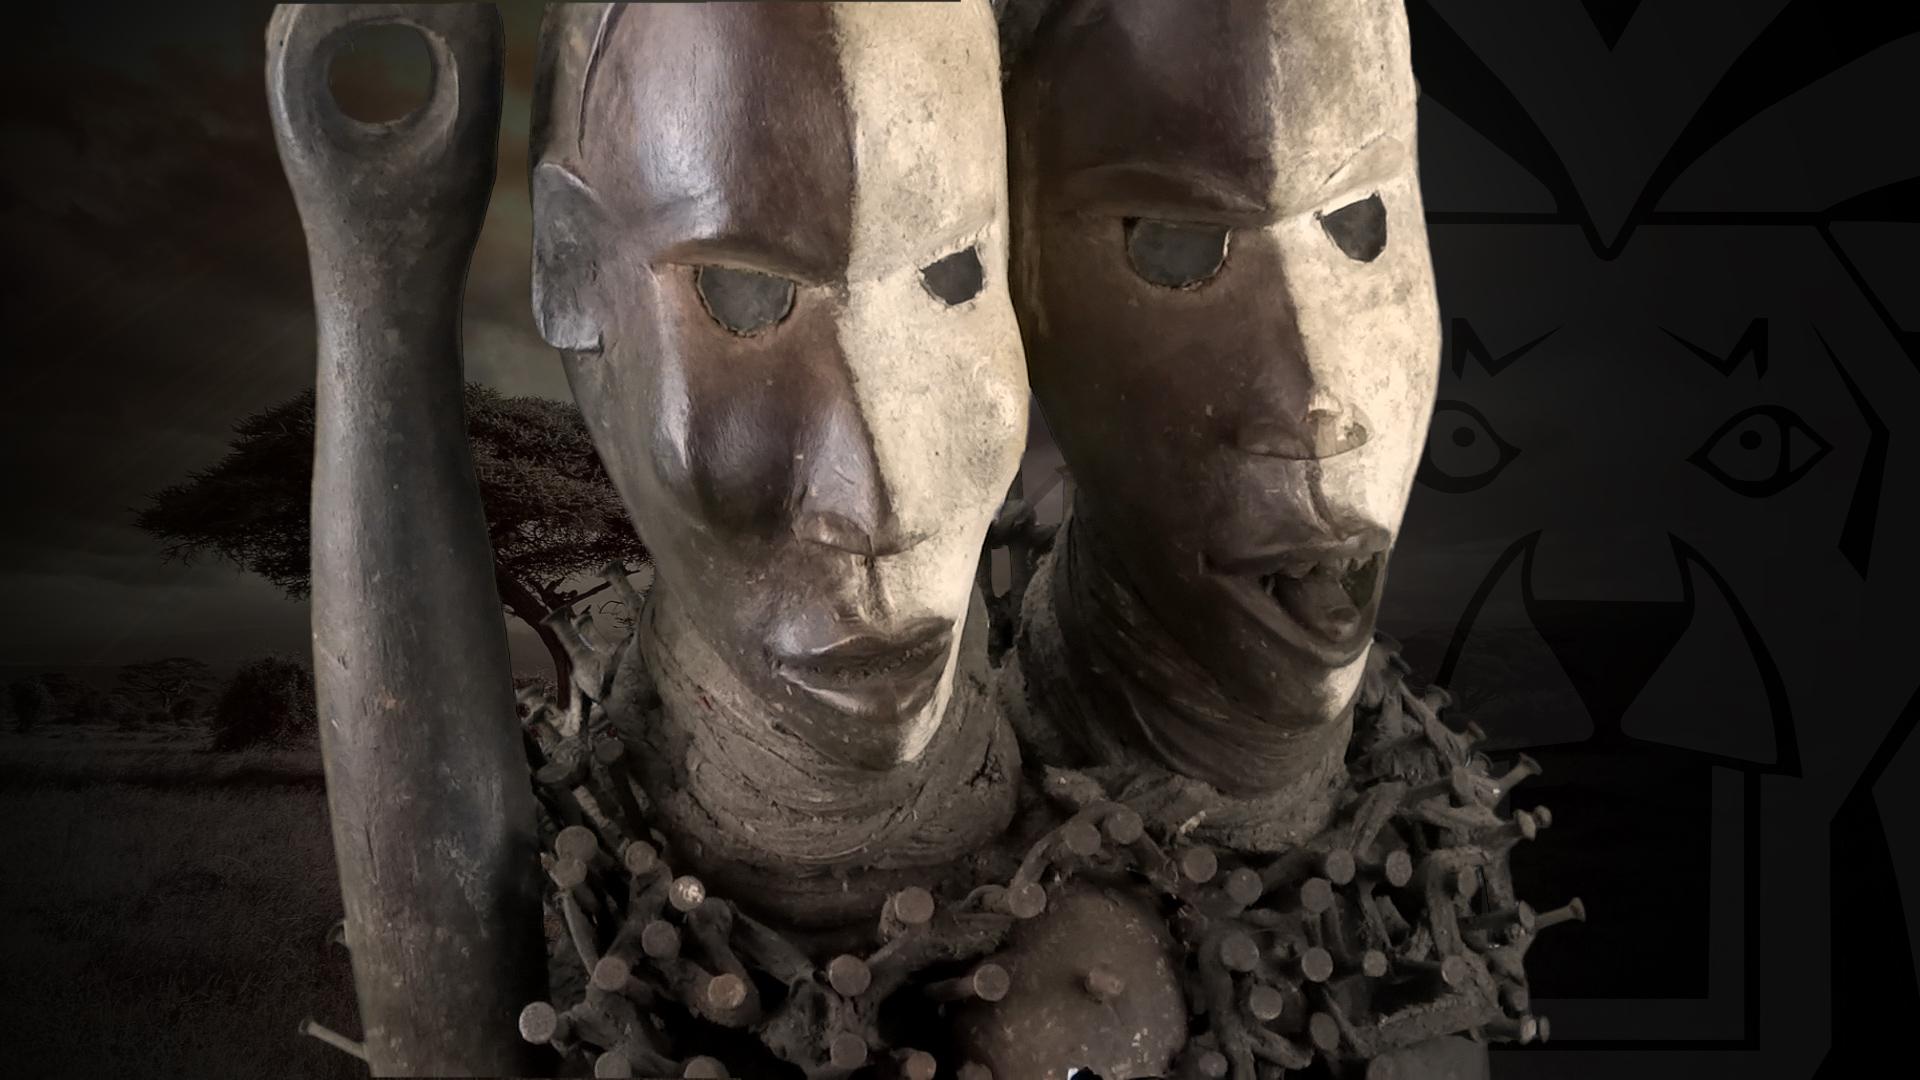 doppelkopf schutzfigur der bakongo dr kongo congo afrika. Black Bedroom Furniture Sets. Home Design Ideas